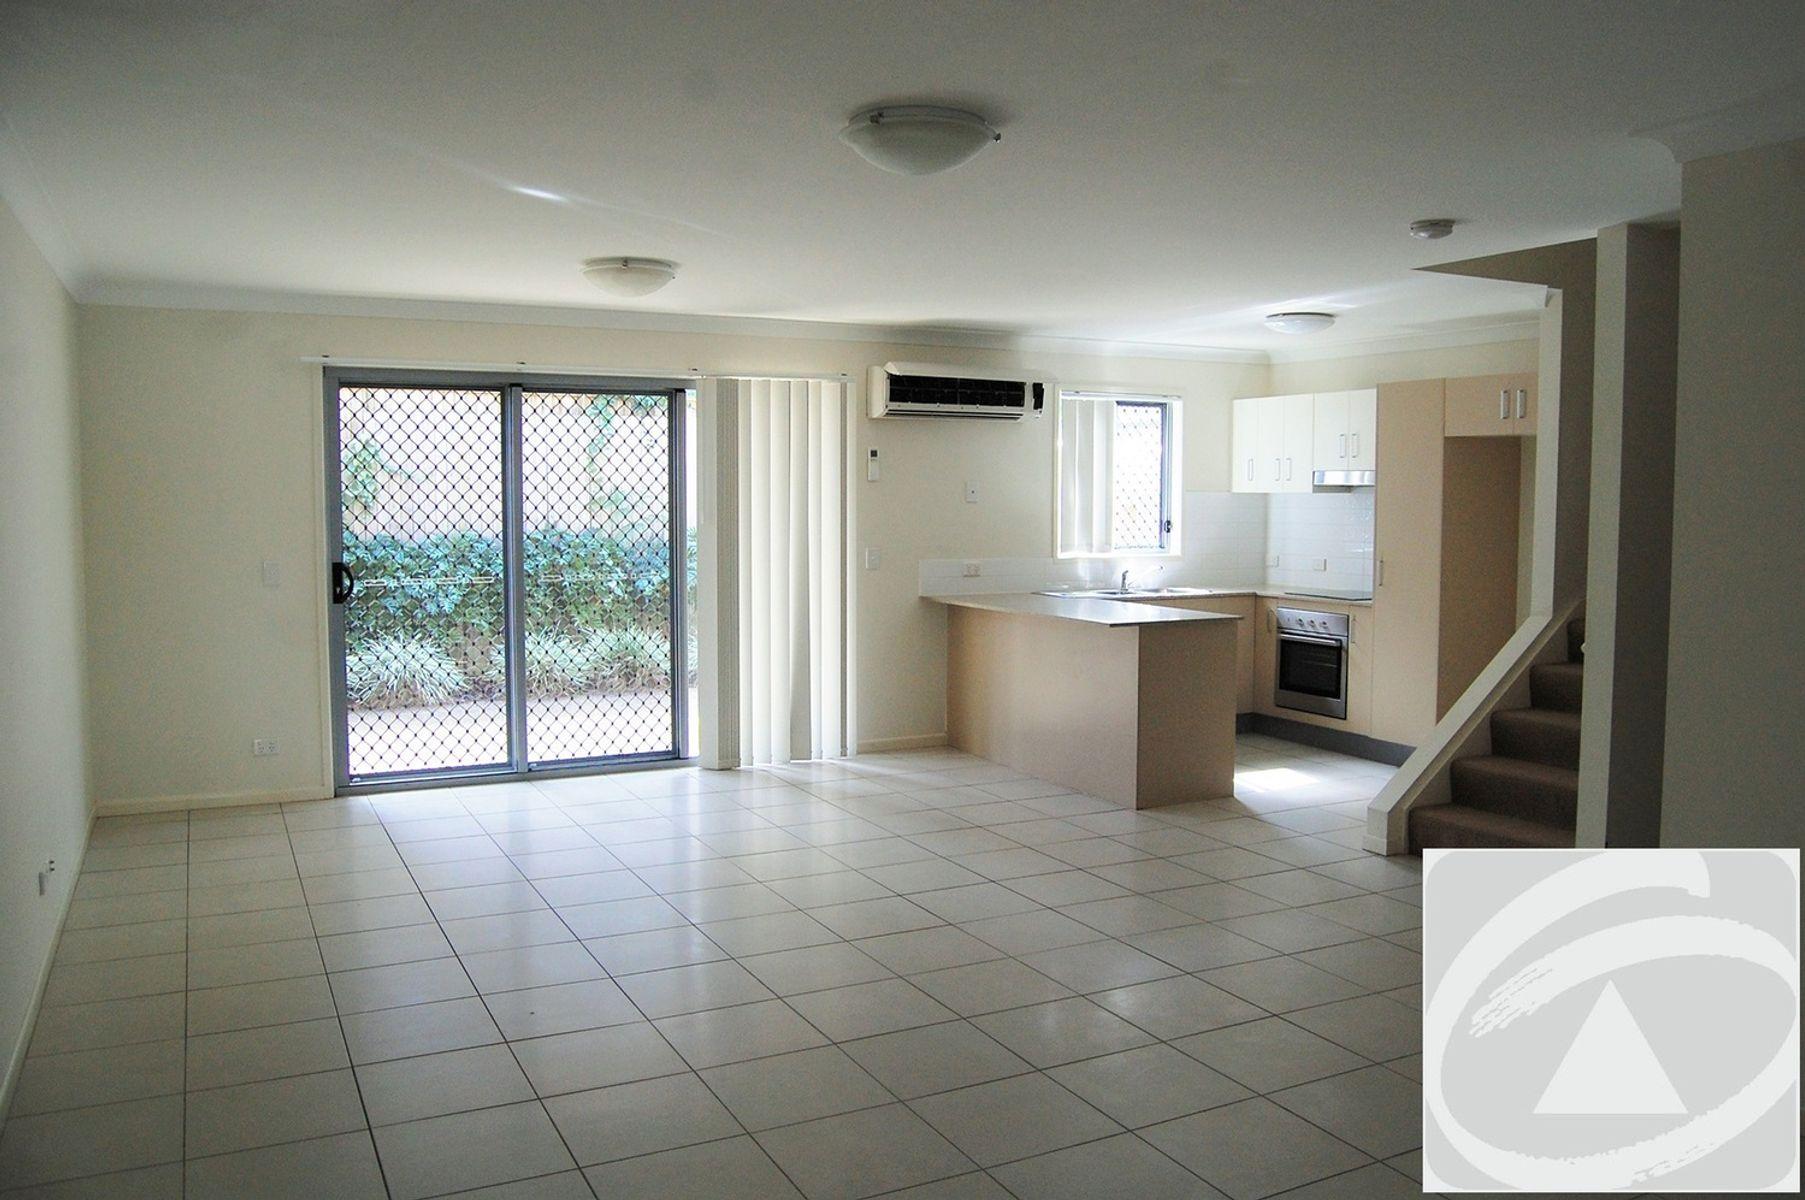 14/2 Diamantina Street, Calamvale, QLD 4116